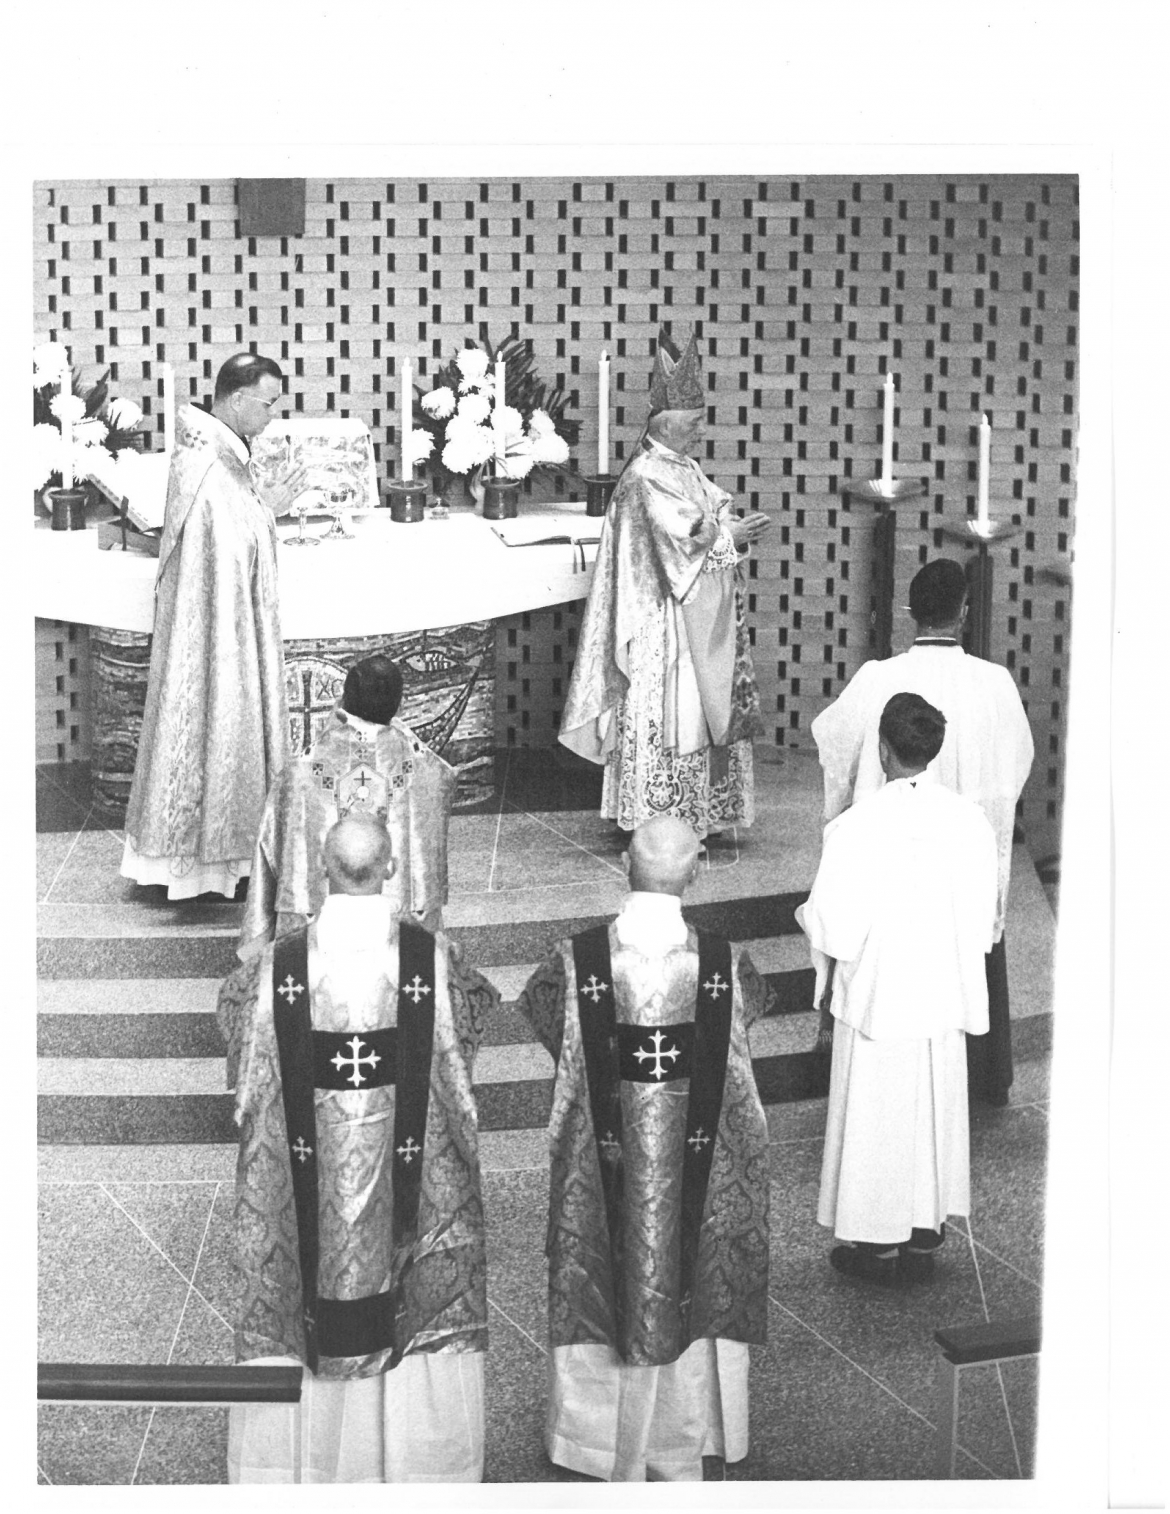 Dedication April 30, 1961